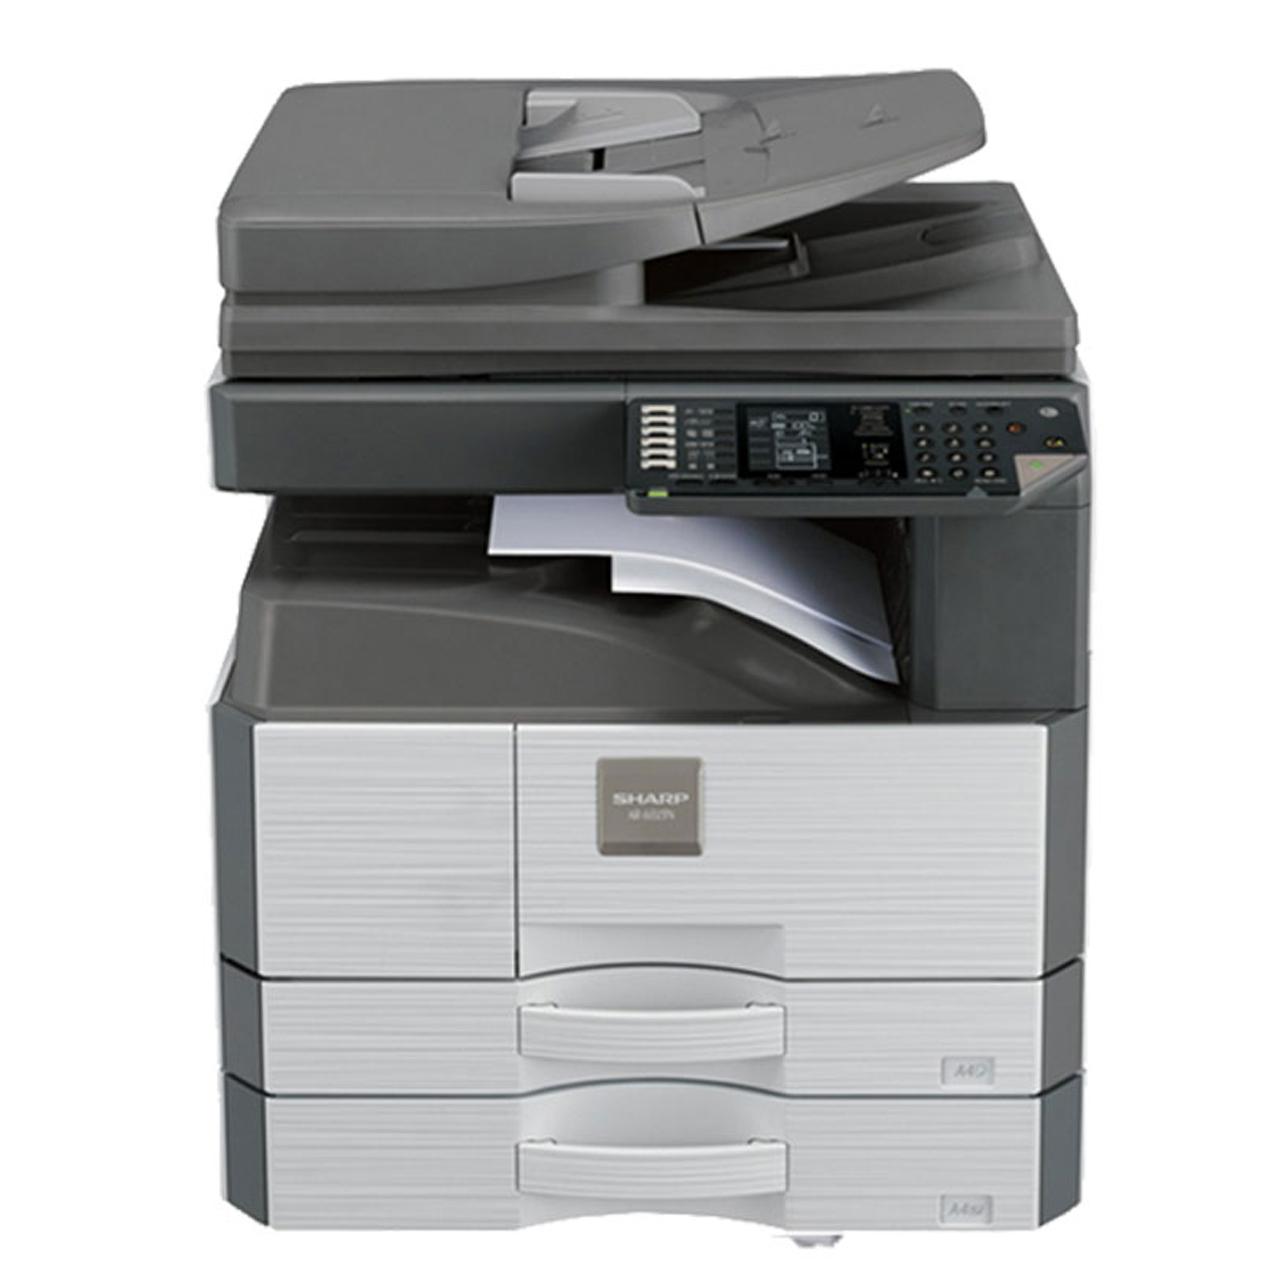 تصویر دستگاه کپی شارپ مدل ایکس 311 ان مجهز به دوپلكس داخلی کپی شارپ AR-X311N with ADF & Dublex 2 Cassette Copier Machine